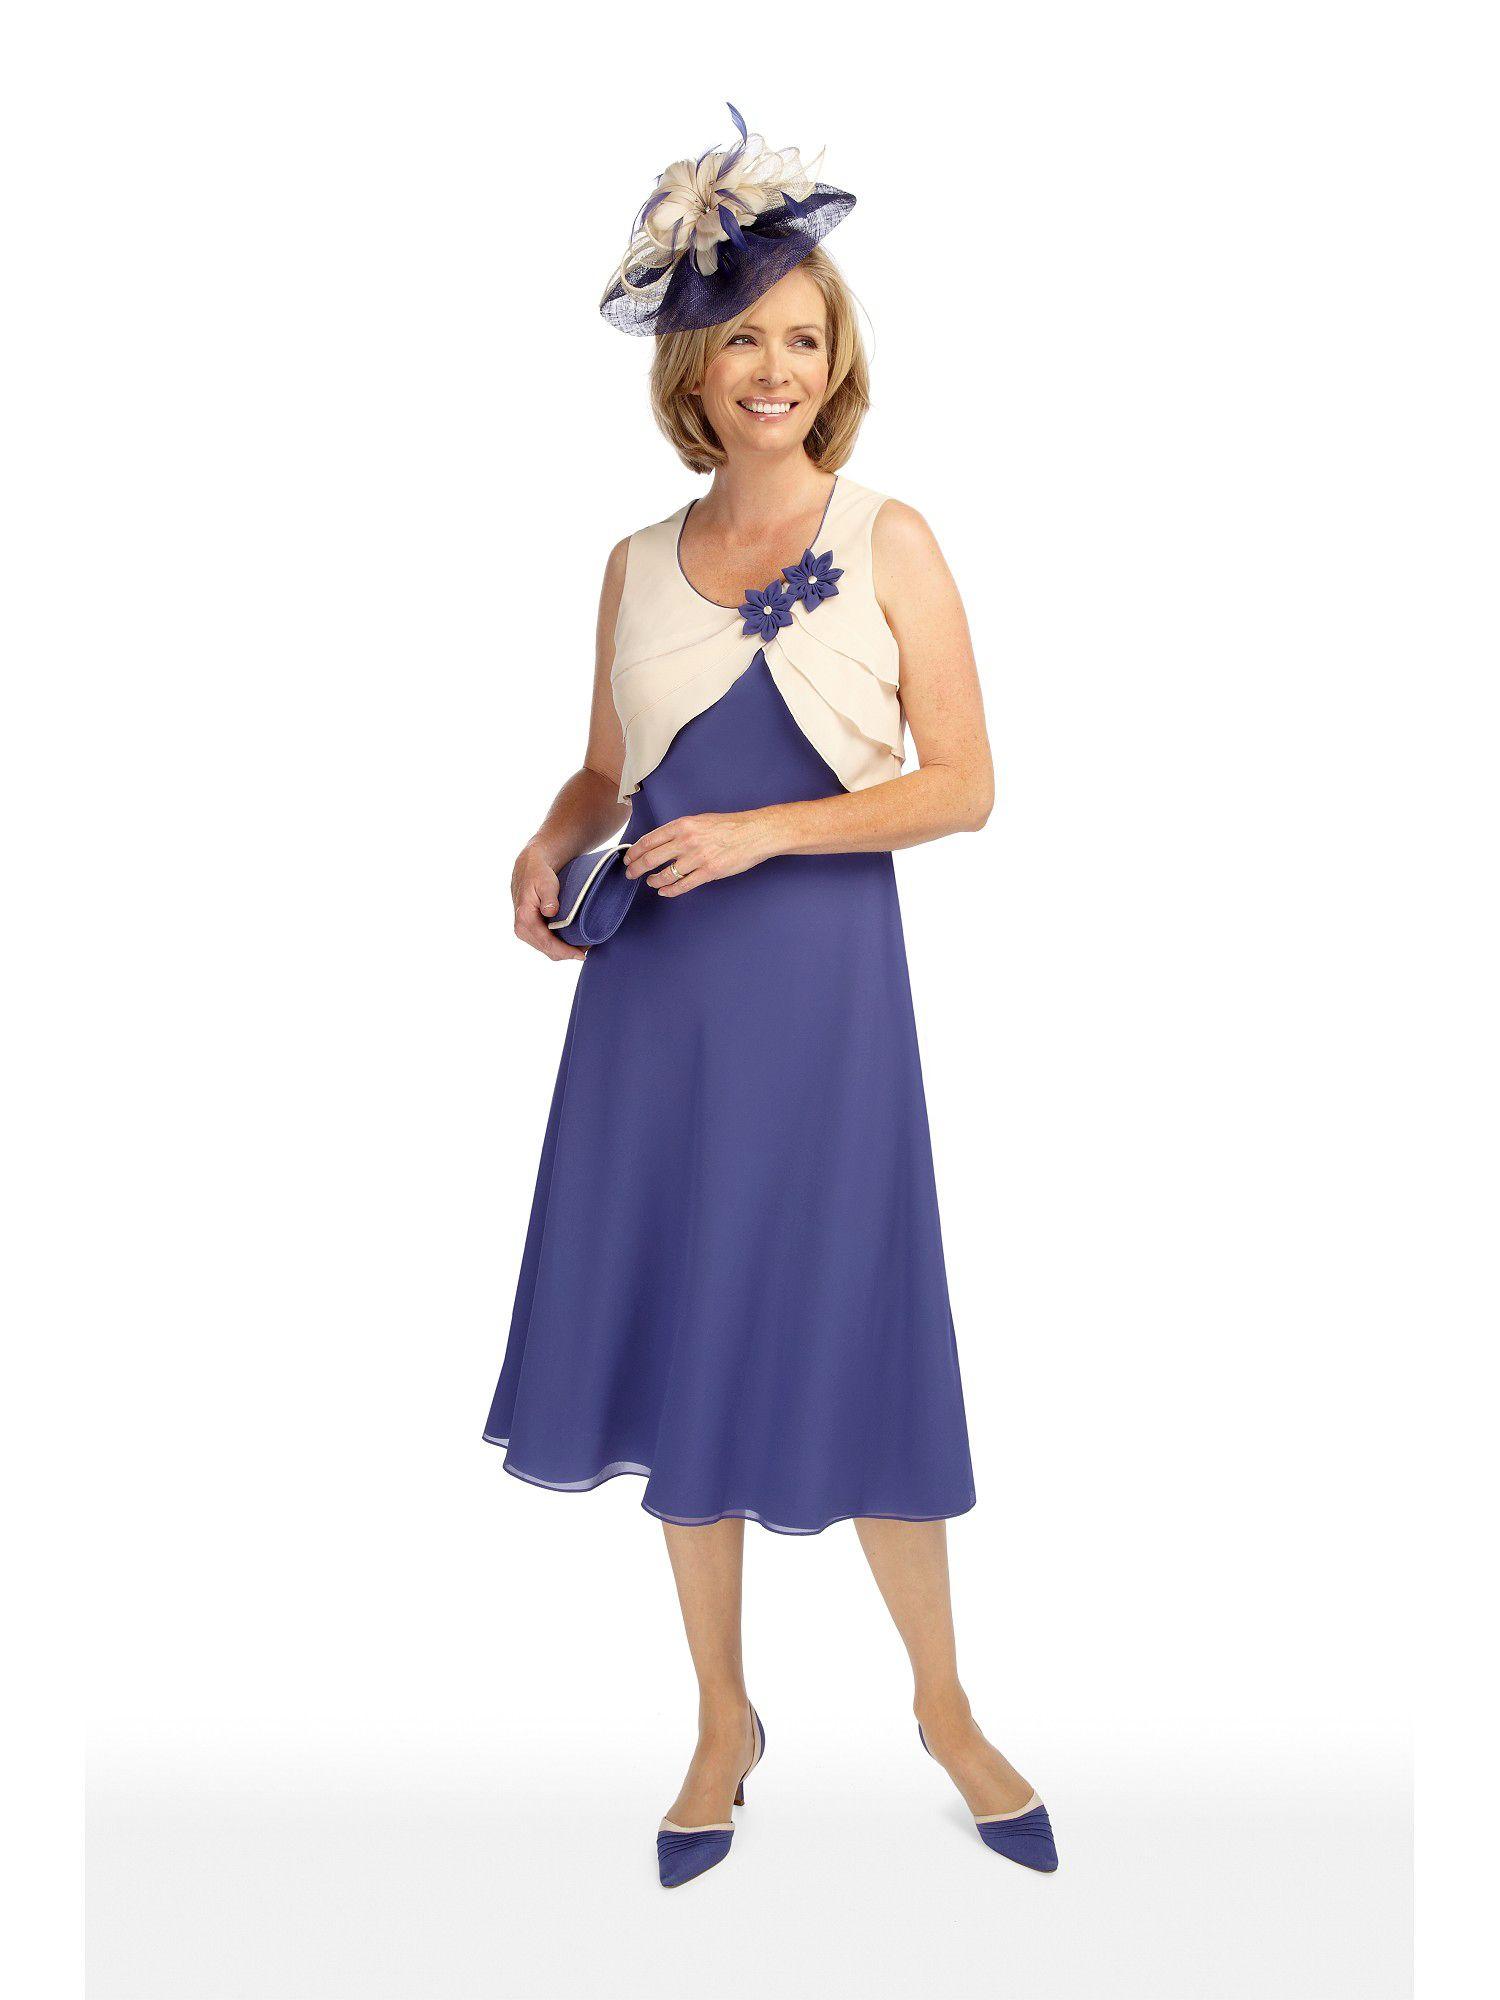 Jacques Vert Chiffon Layered Bodice Dress in Blue - Lyst